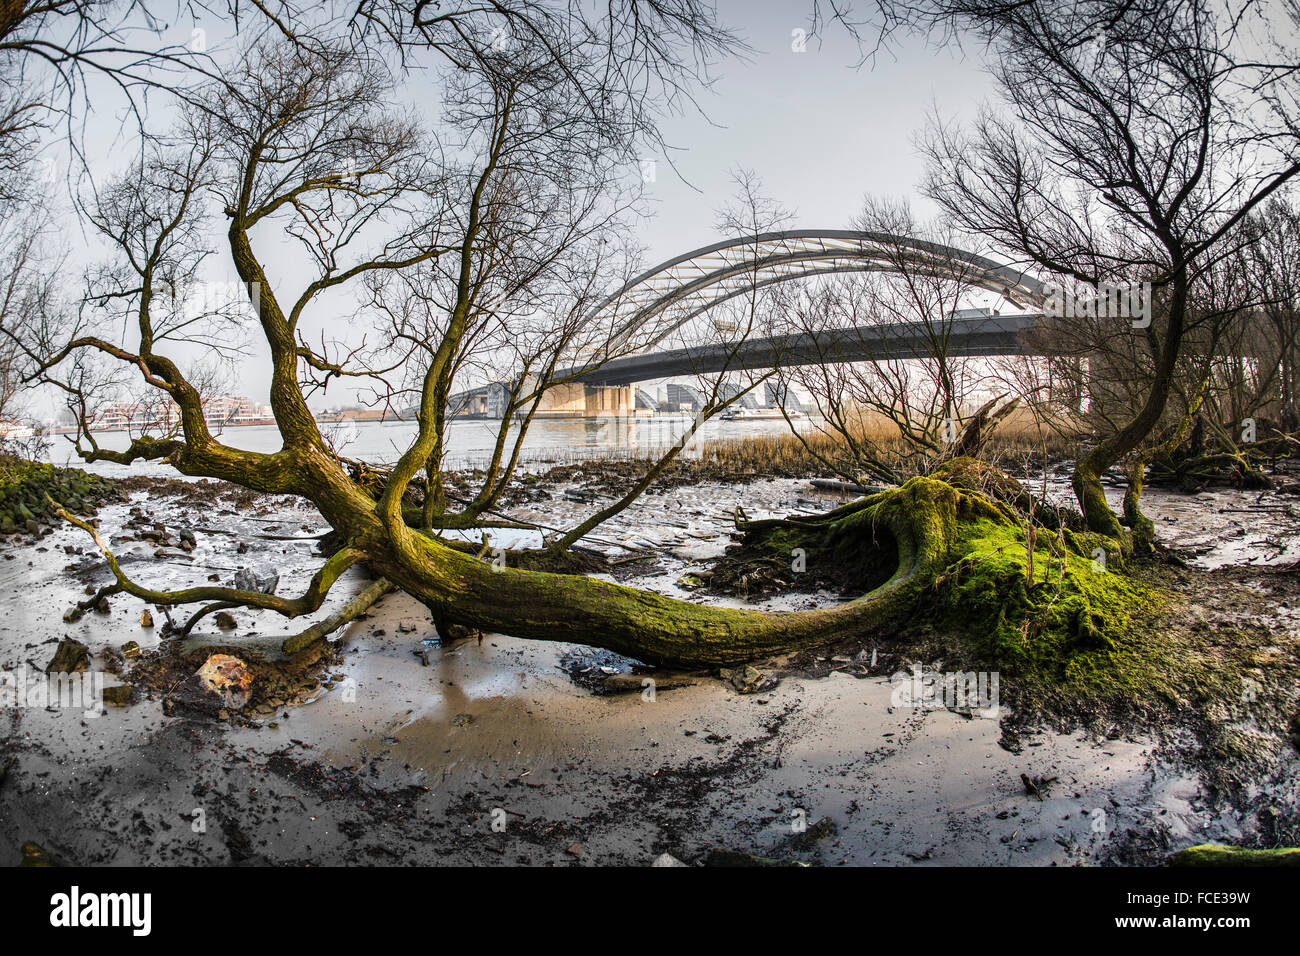 Netherlands, Rotterdam, Nature reserve called Eiland van Brienenoord near the Van Brienenoord bridge - Stock Image